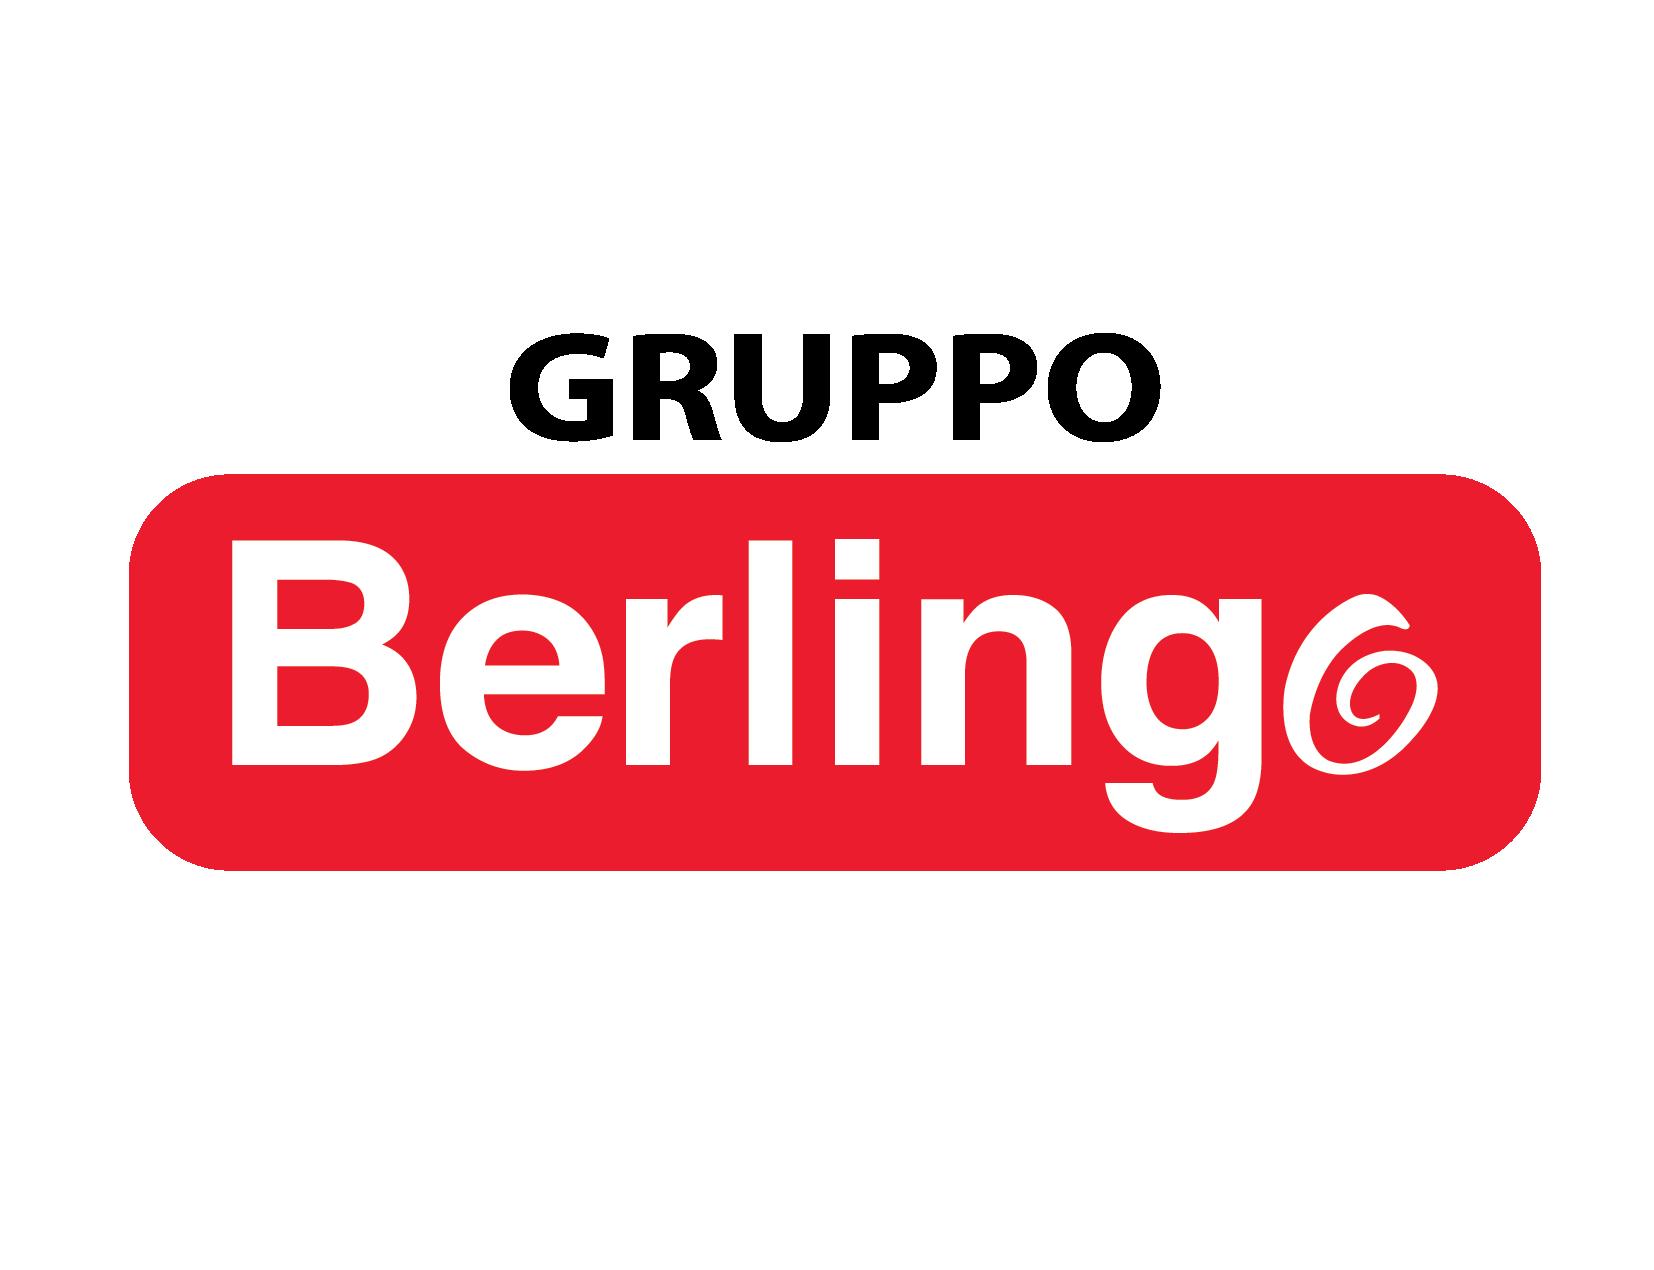 GRUPPO BERLINGO